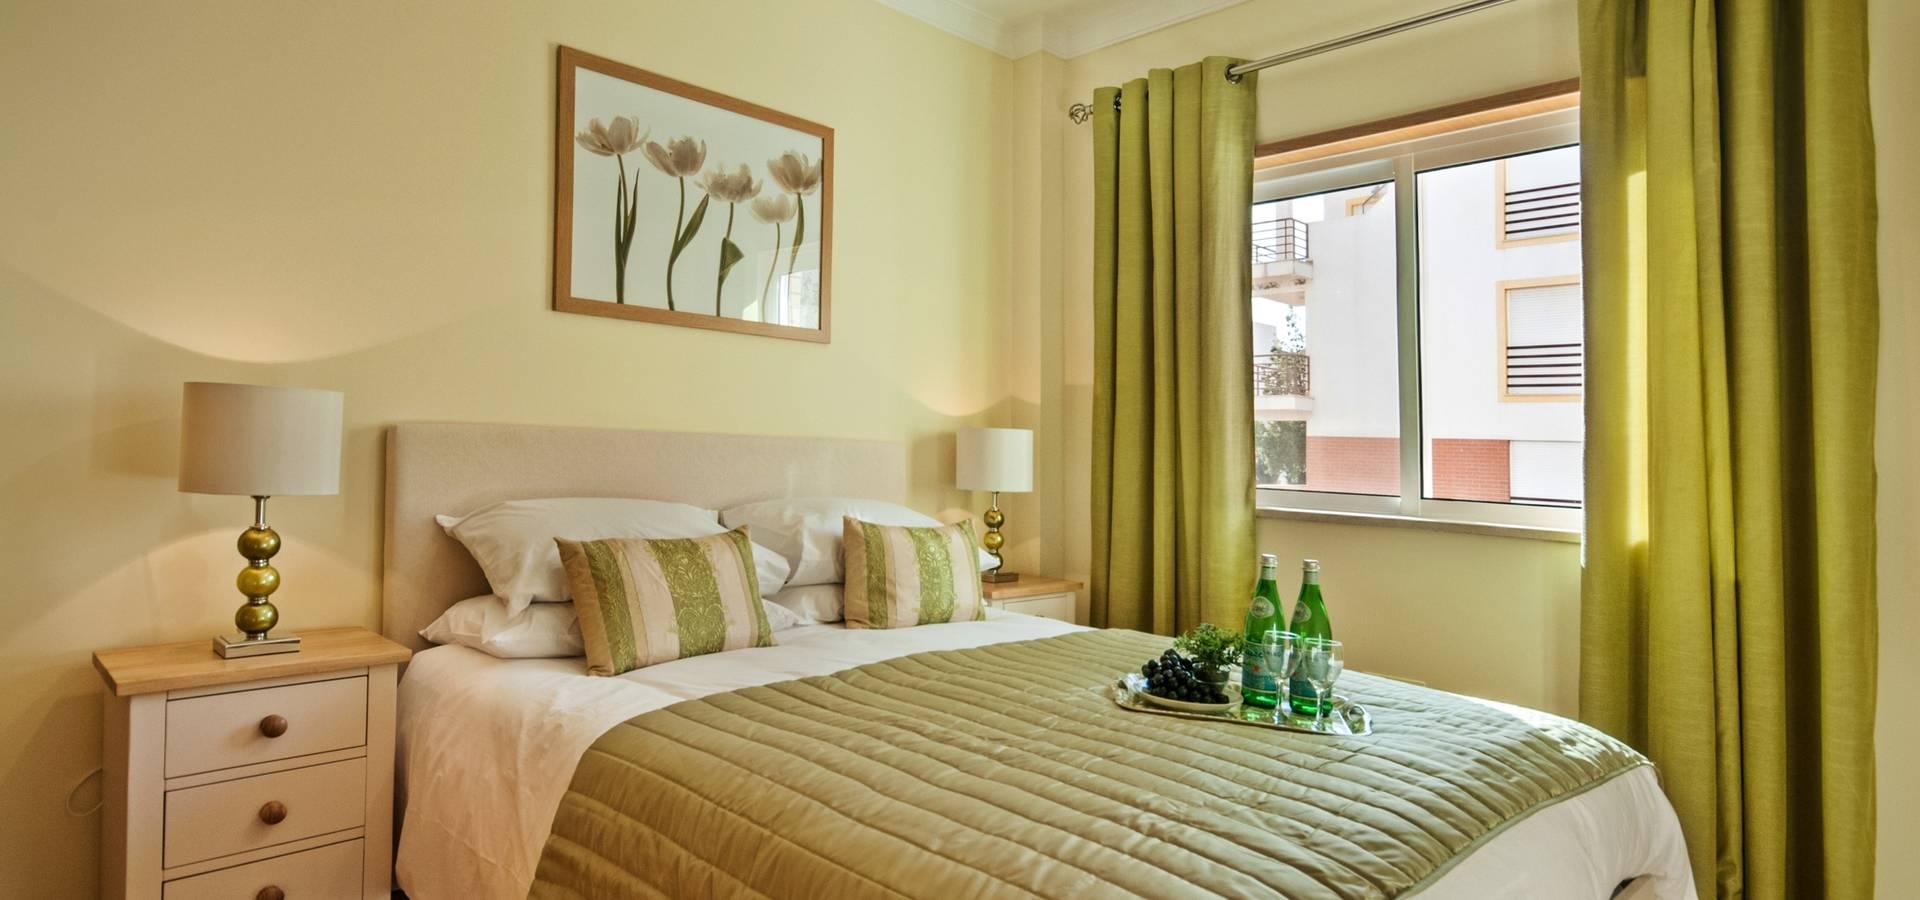 Frontera Furniture Algarve